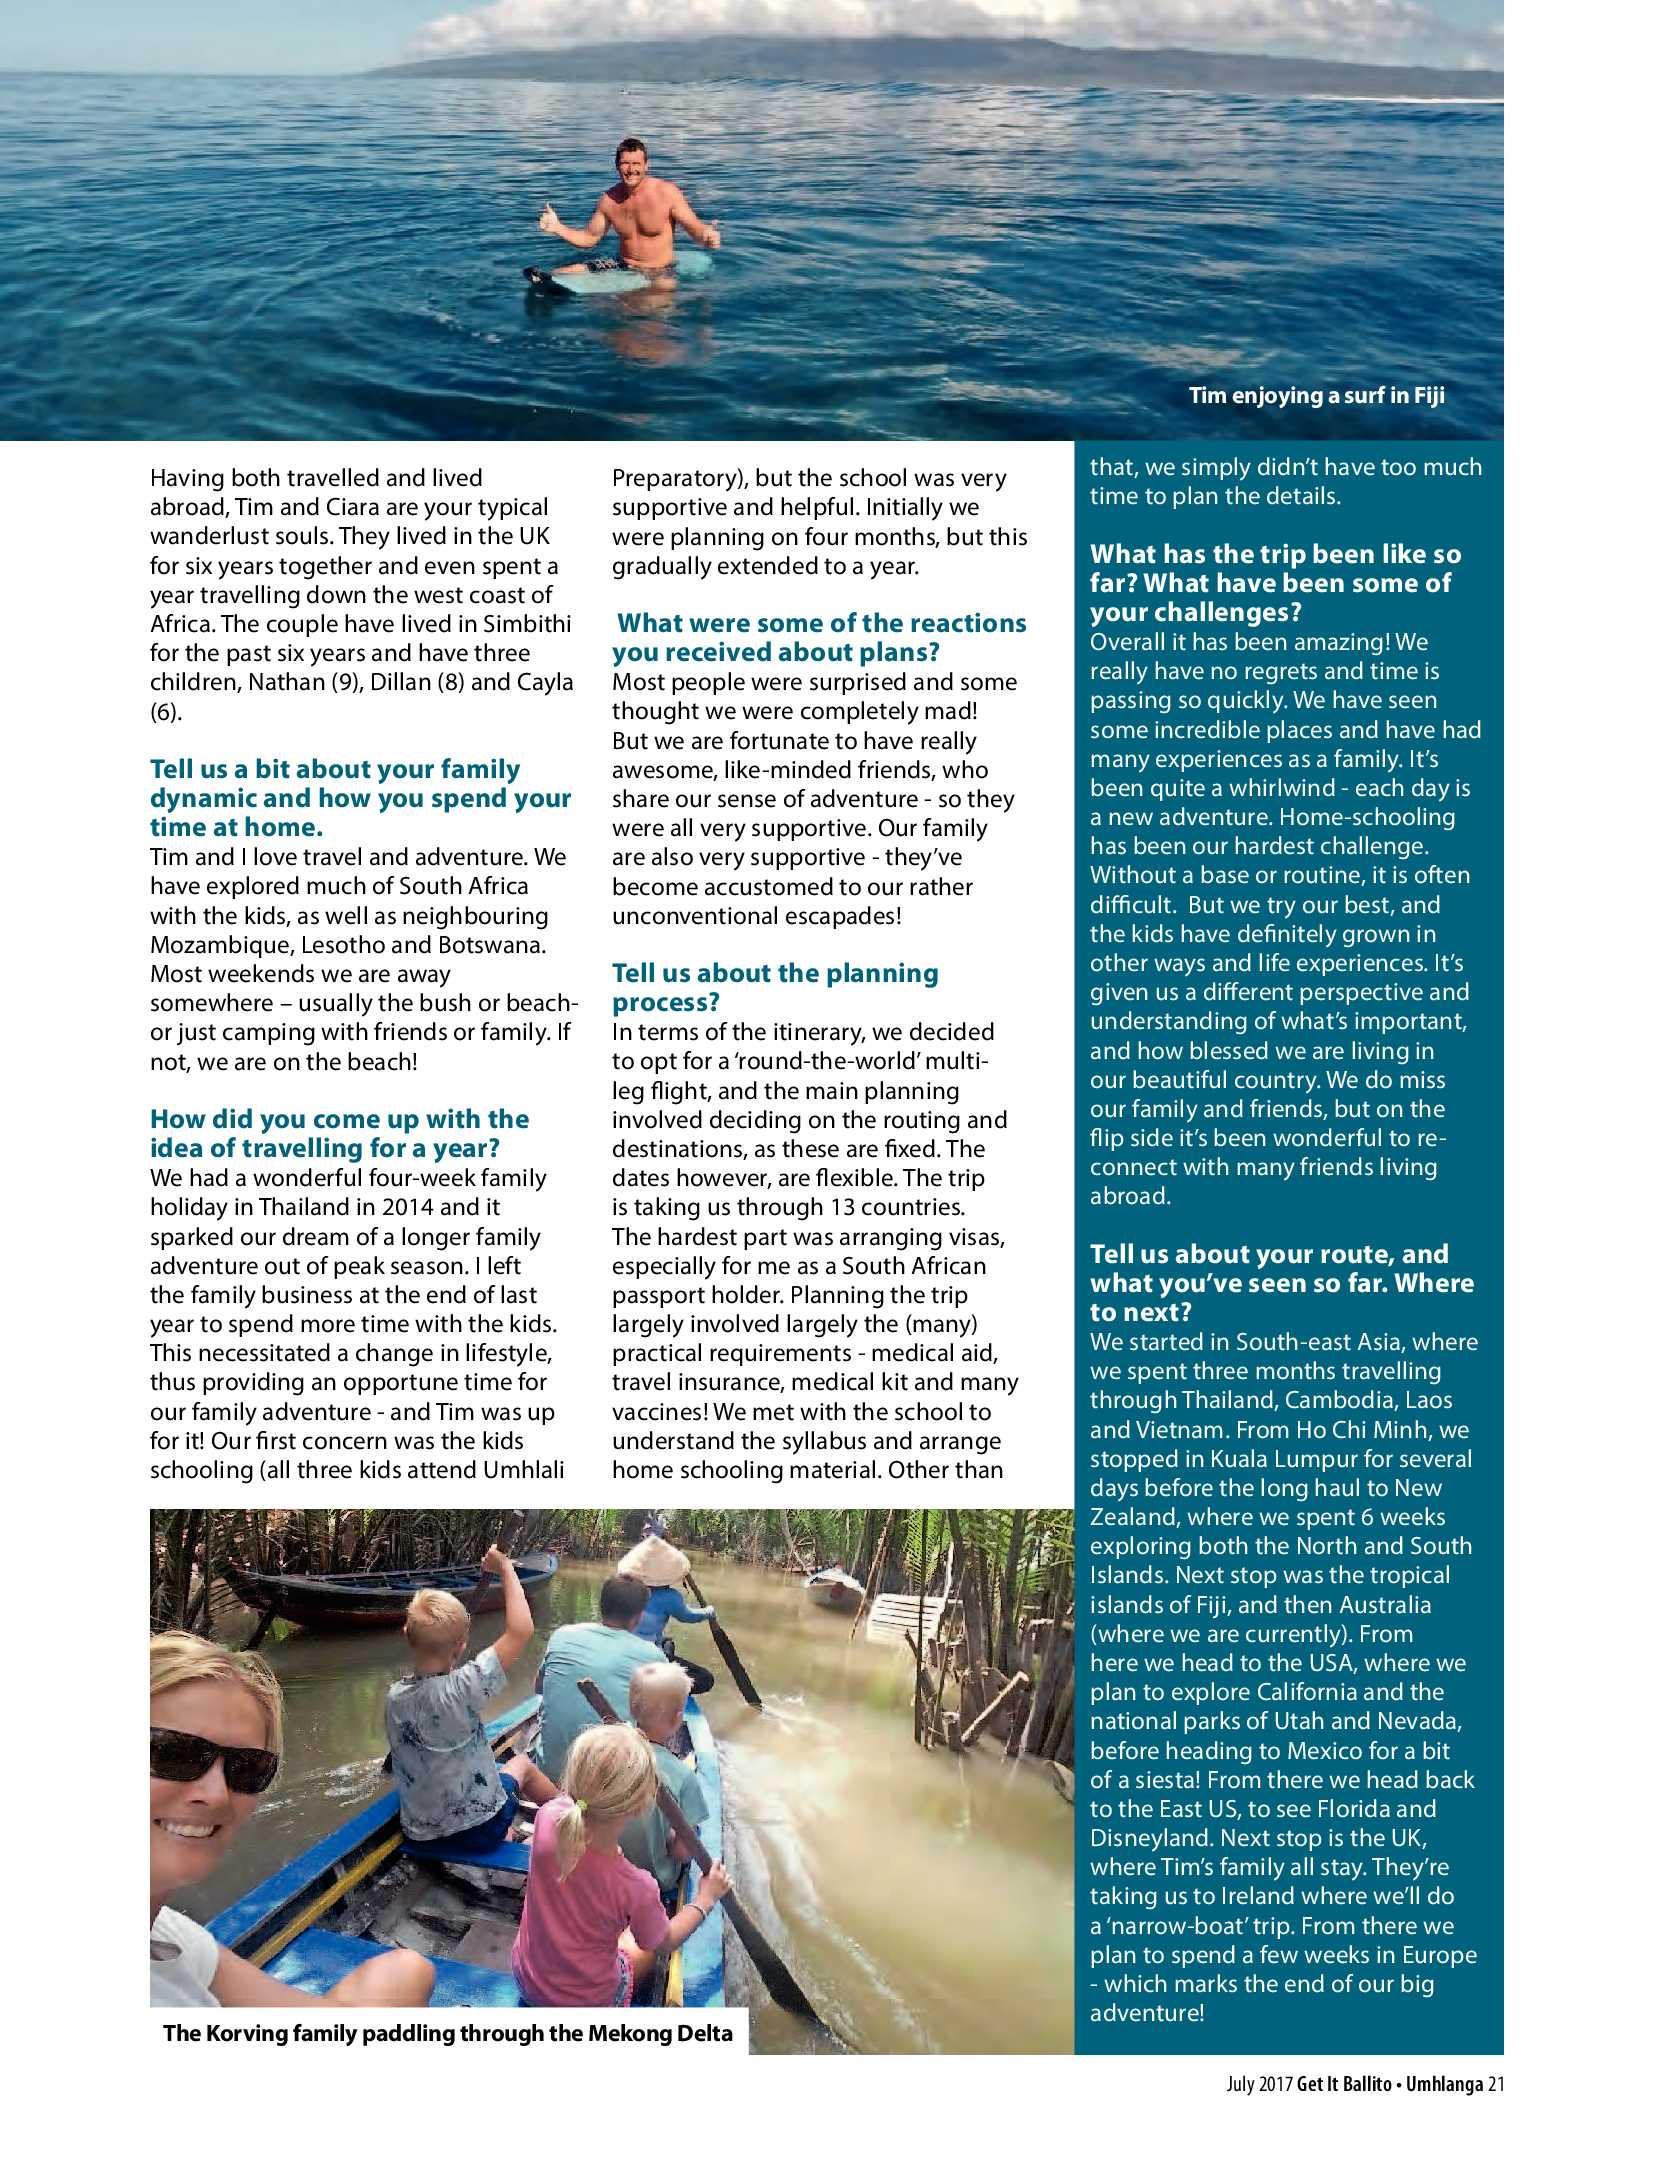 get-magazine-ballitoumhlanga-july-2017-2-epapers-page-23